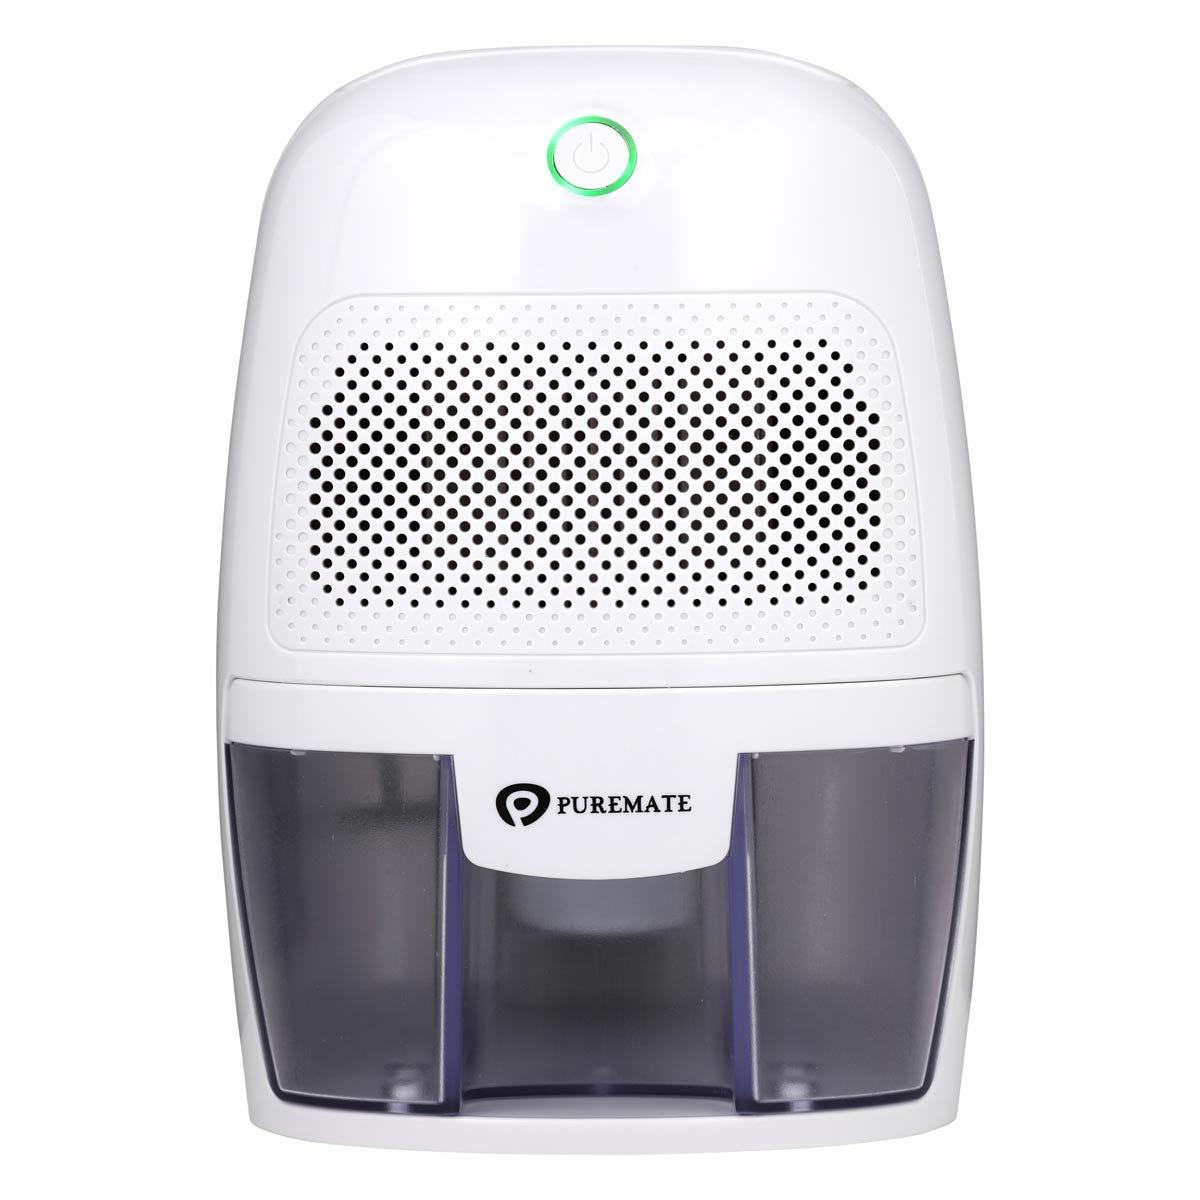 PureMate 600ml Air Dehumidifier for Damp, Mould, Condensation & Moisture - White